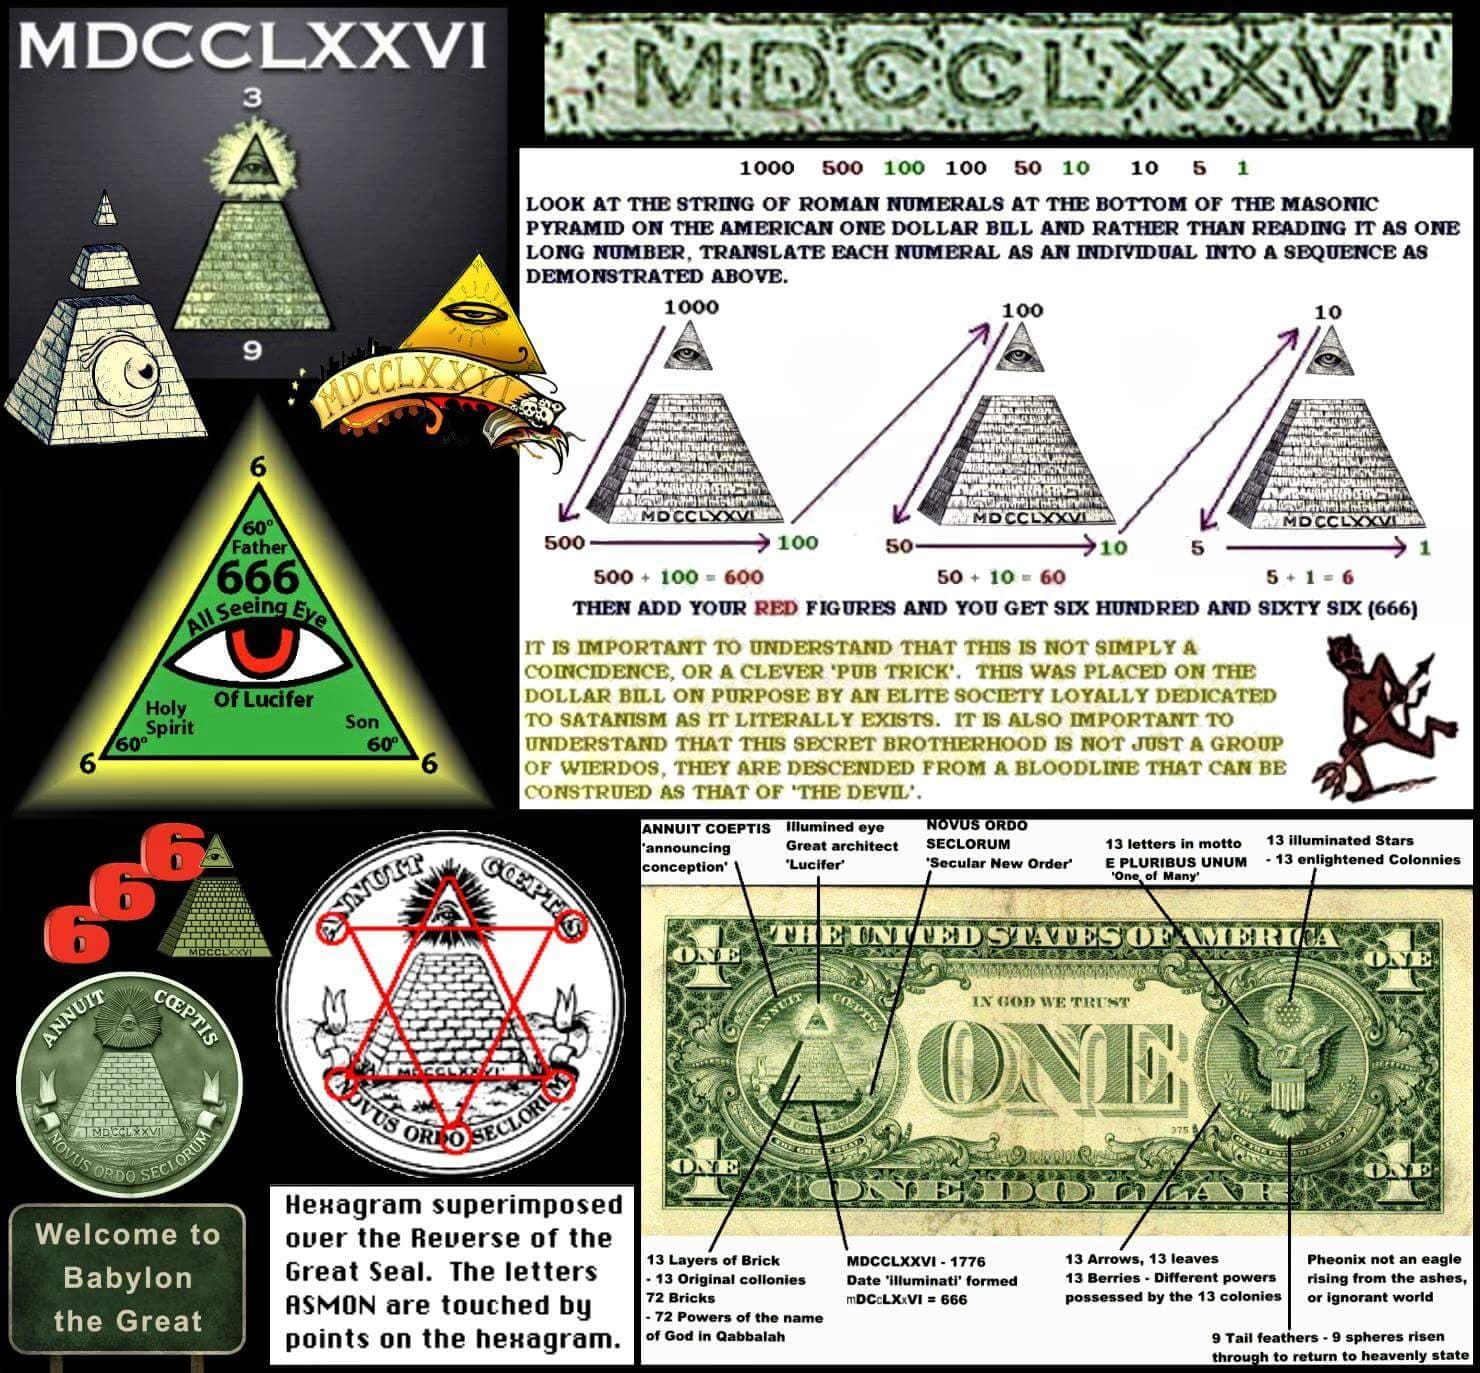 666 Masonic Money | Símbolos masónicos, Simbolos illuminatis, Antiguo arte  egipcio